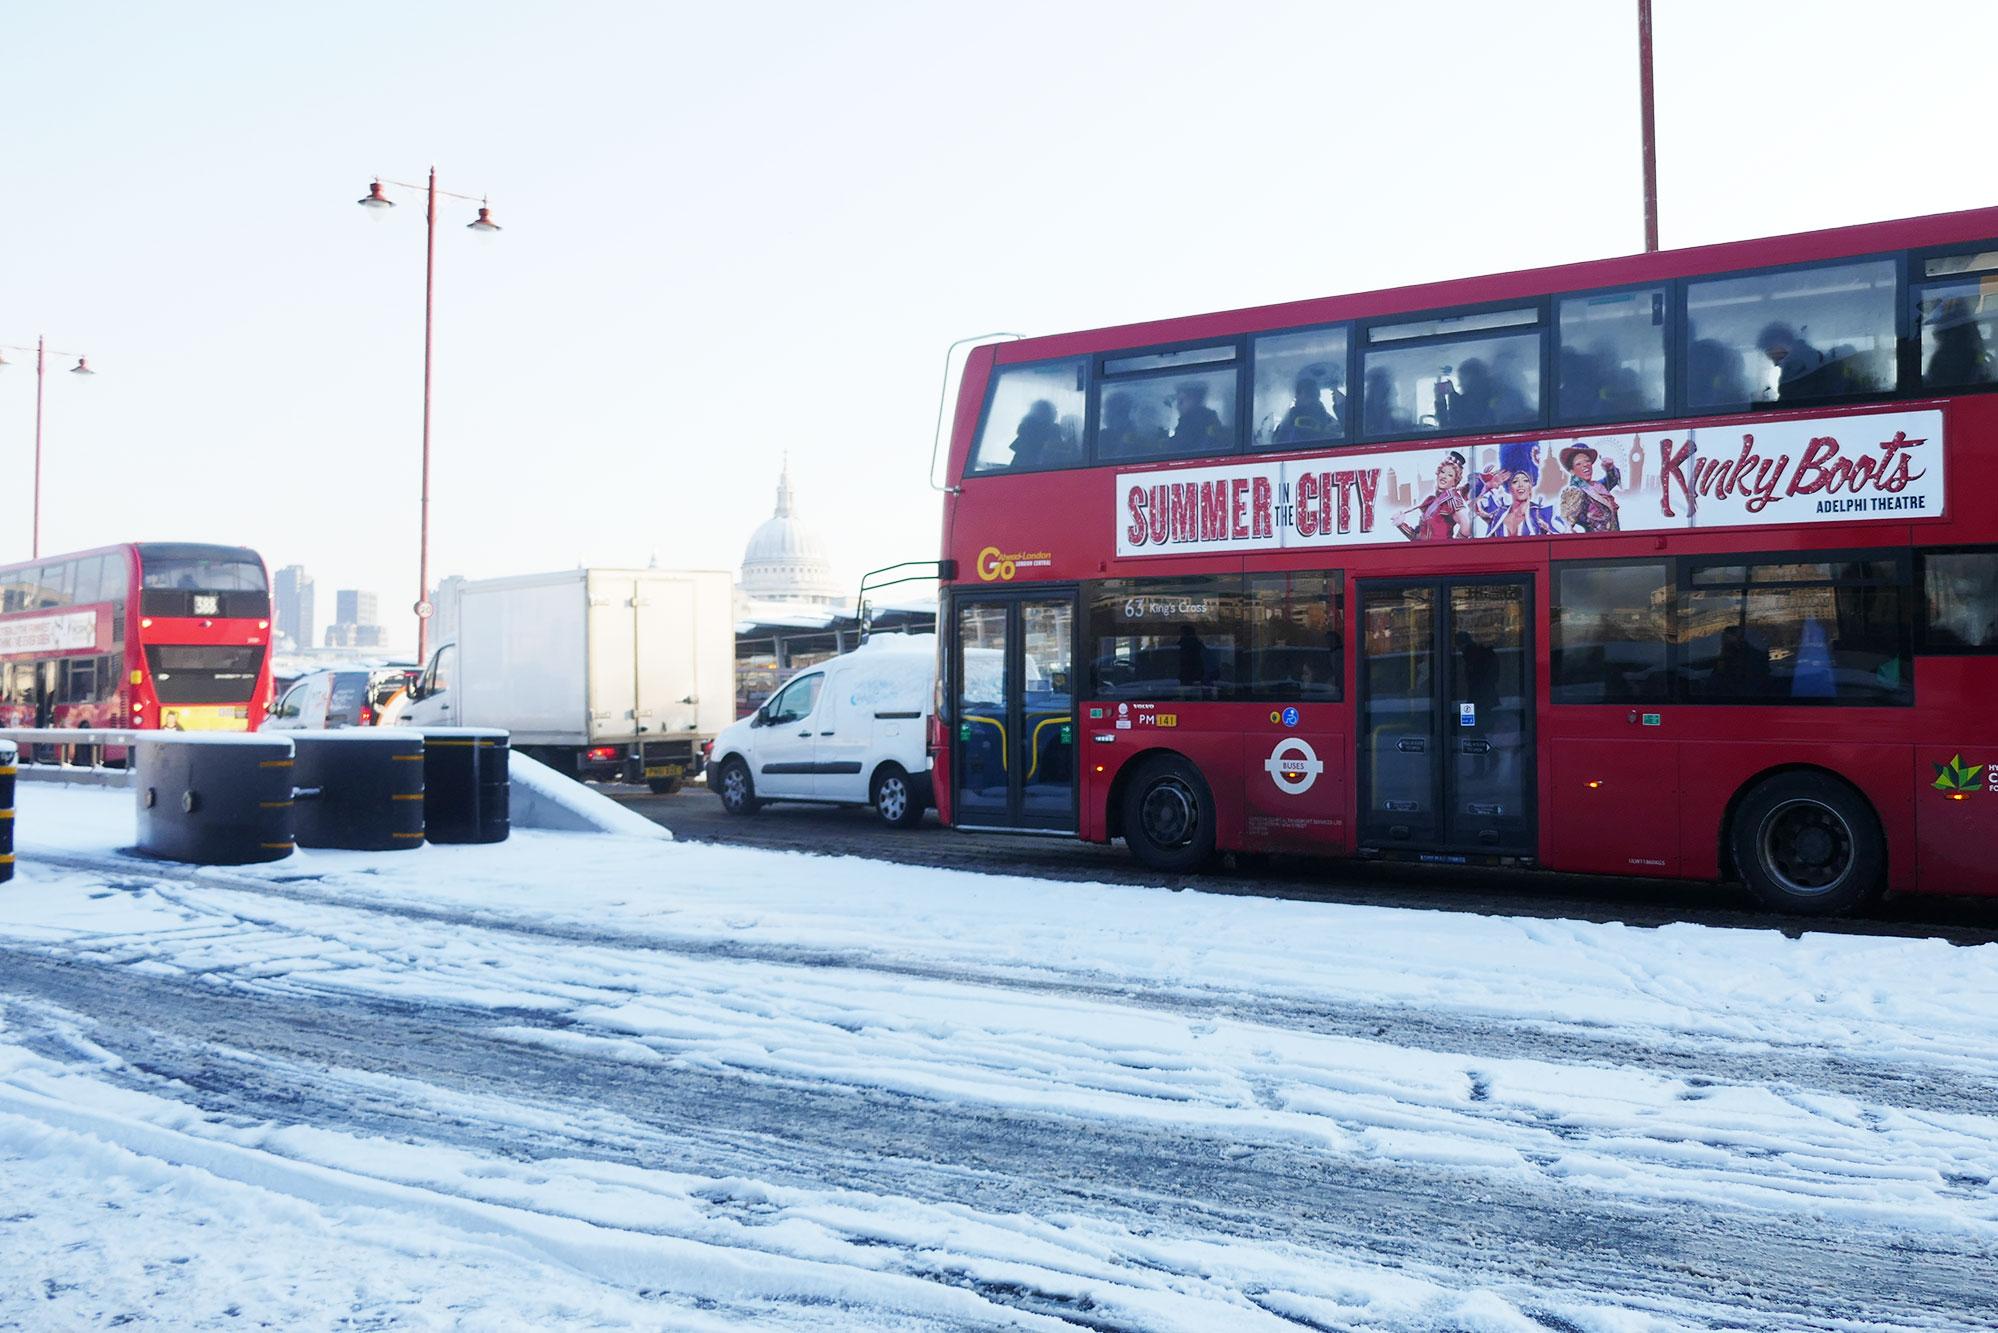 Hooray_snow_Bus.jpg